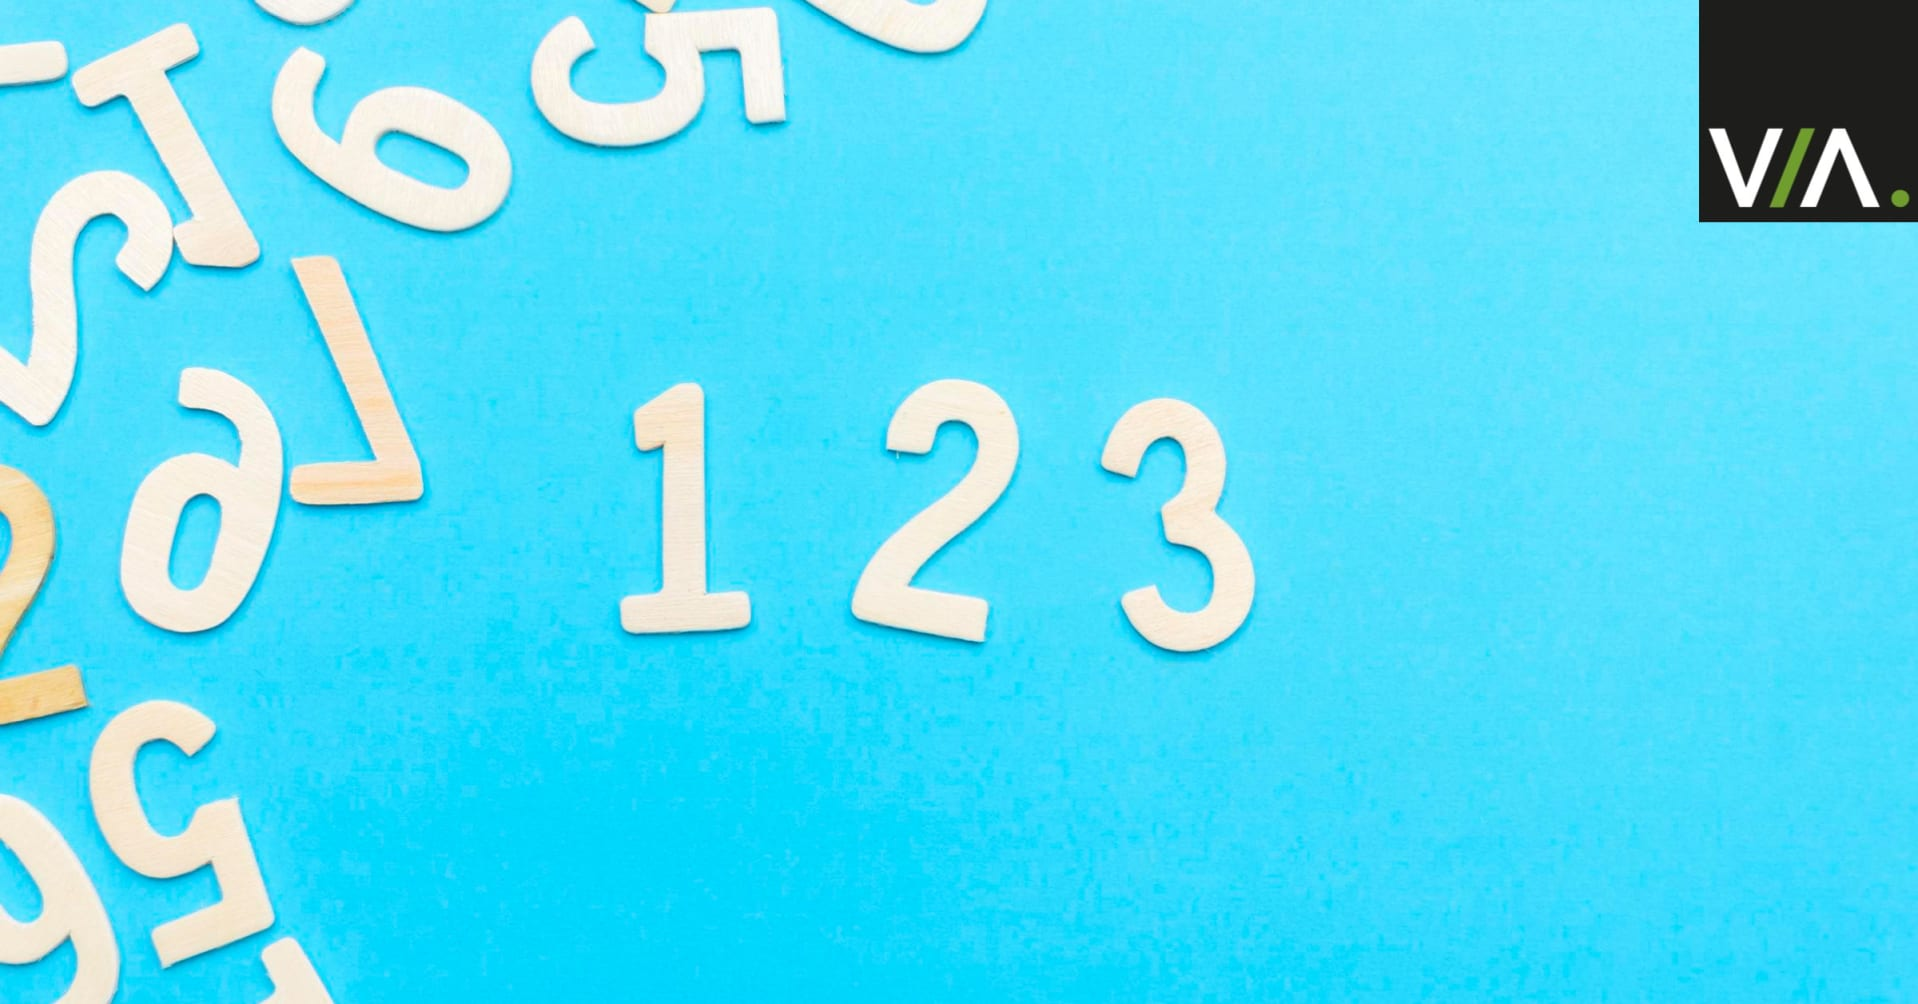 Pasivhaus en números